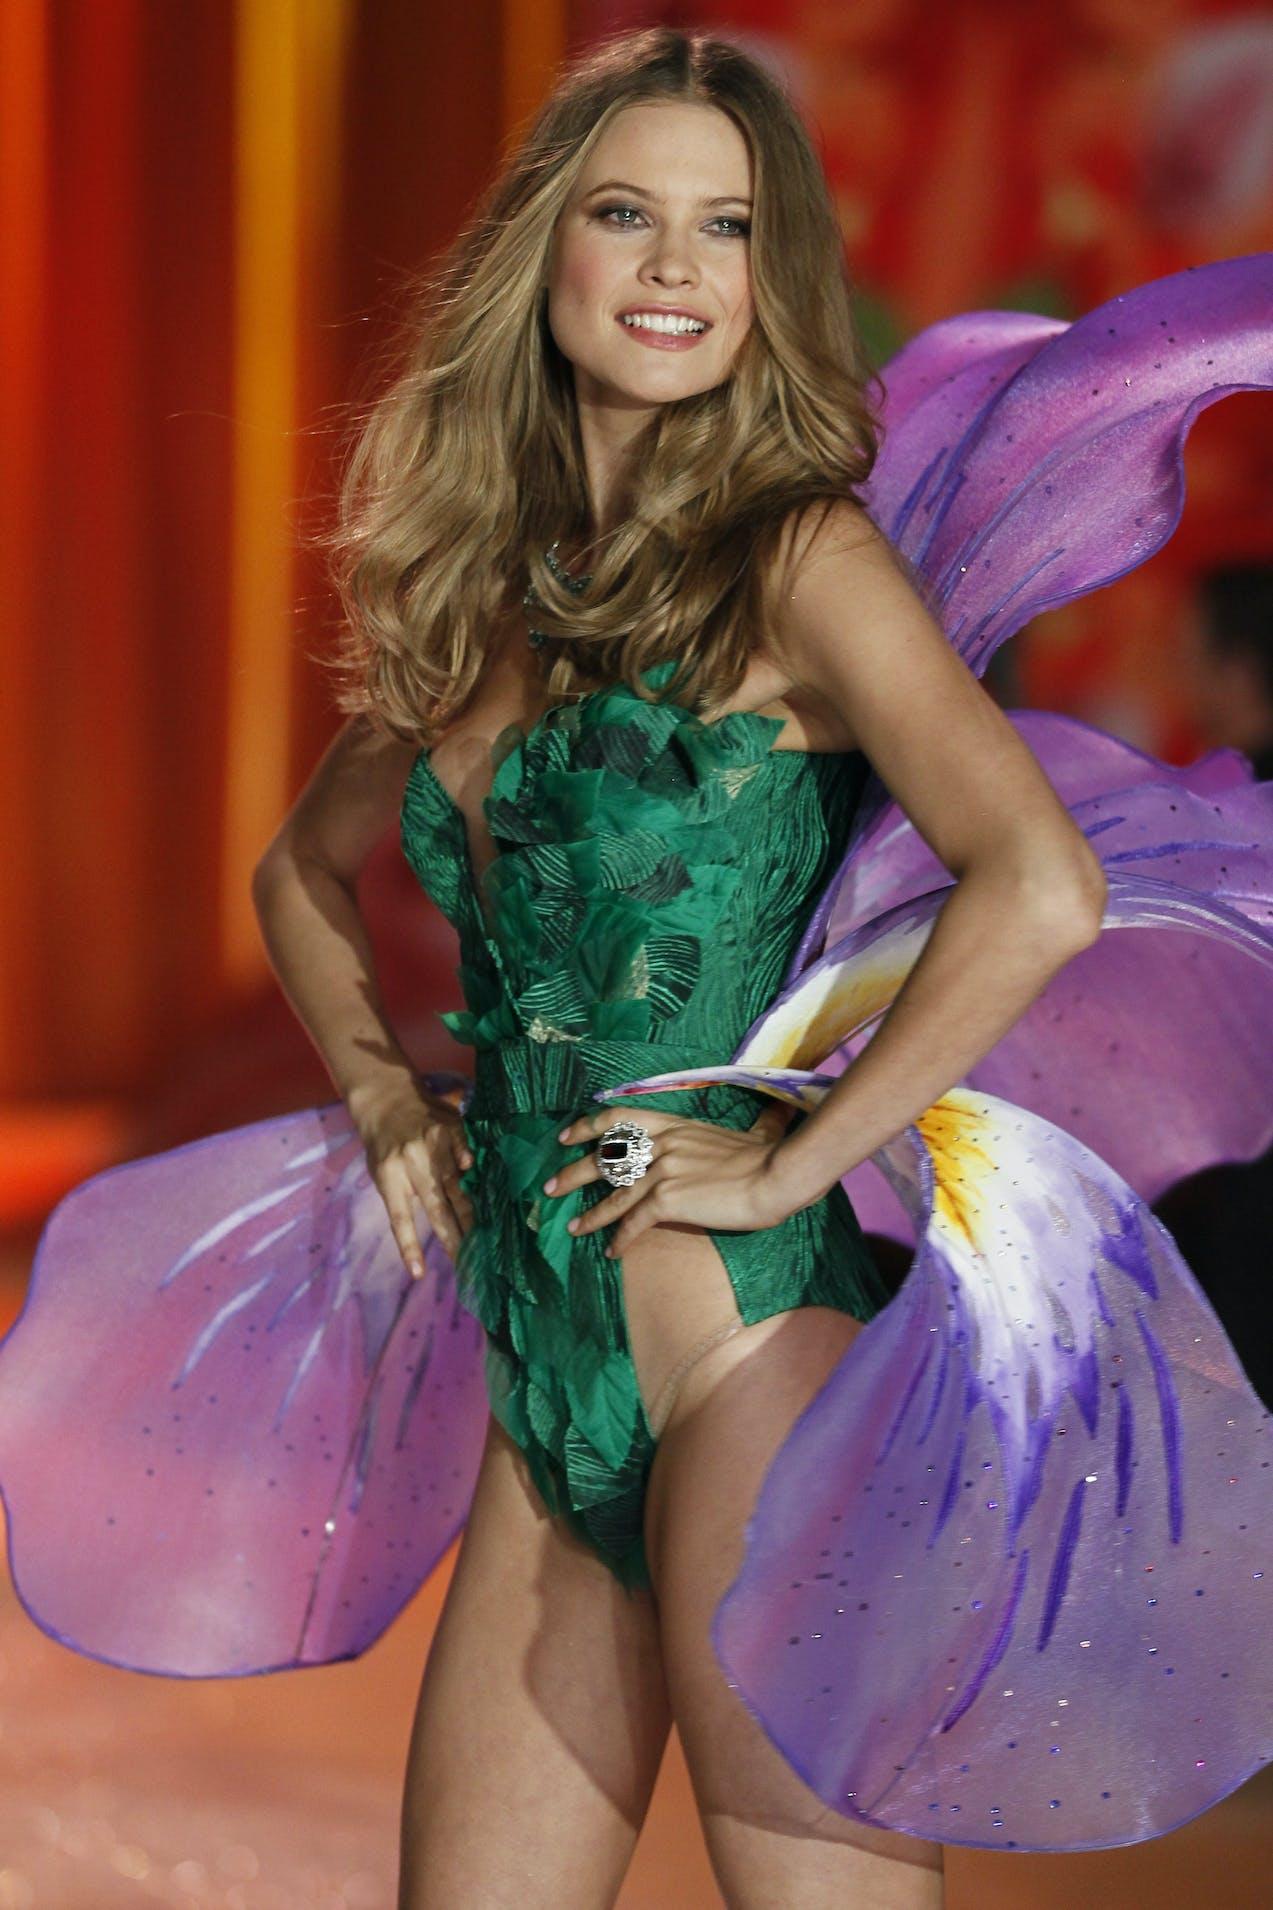 (c) 2012 VICTORIA'S SECRET FASHION SHOW